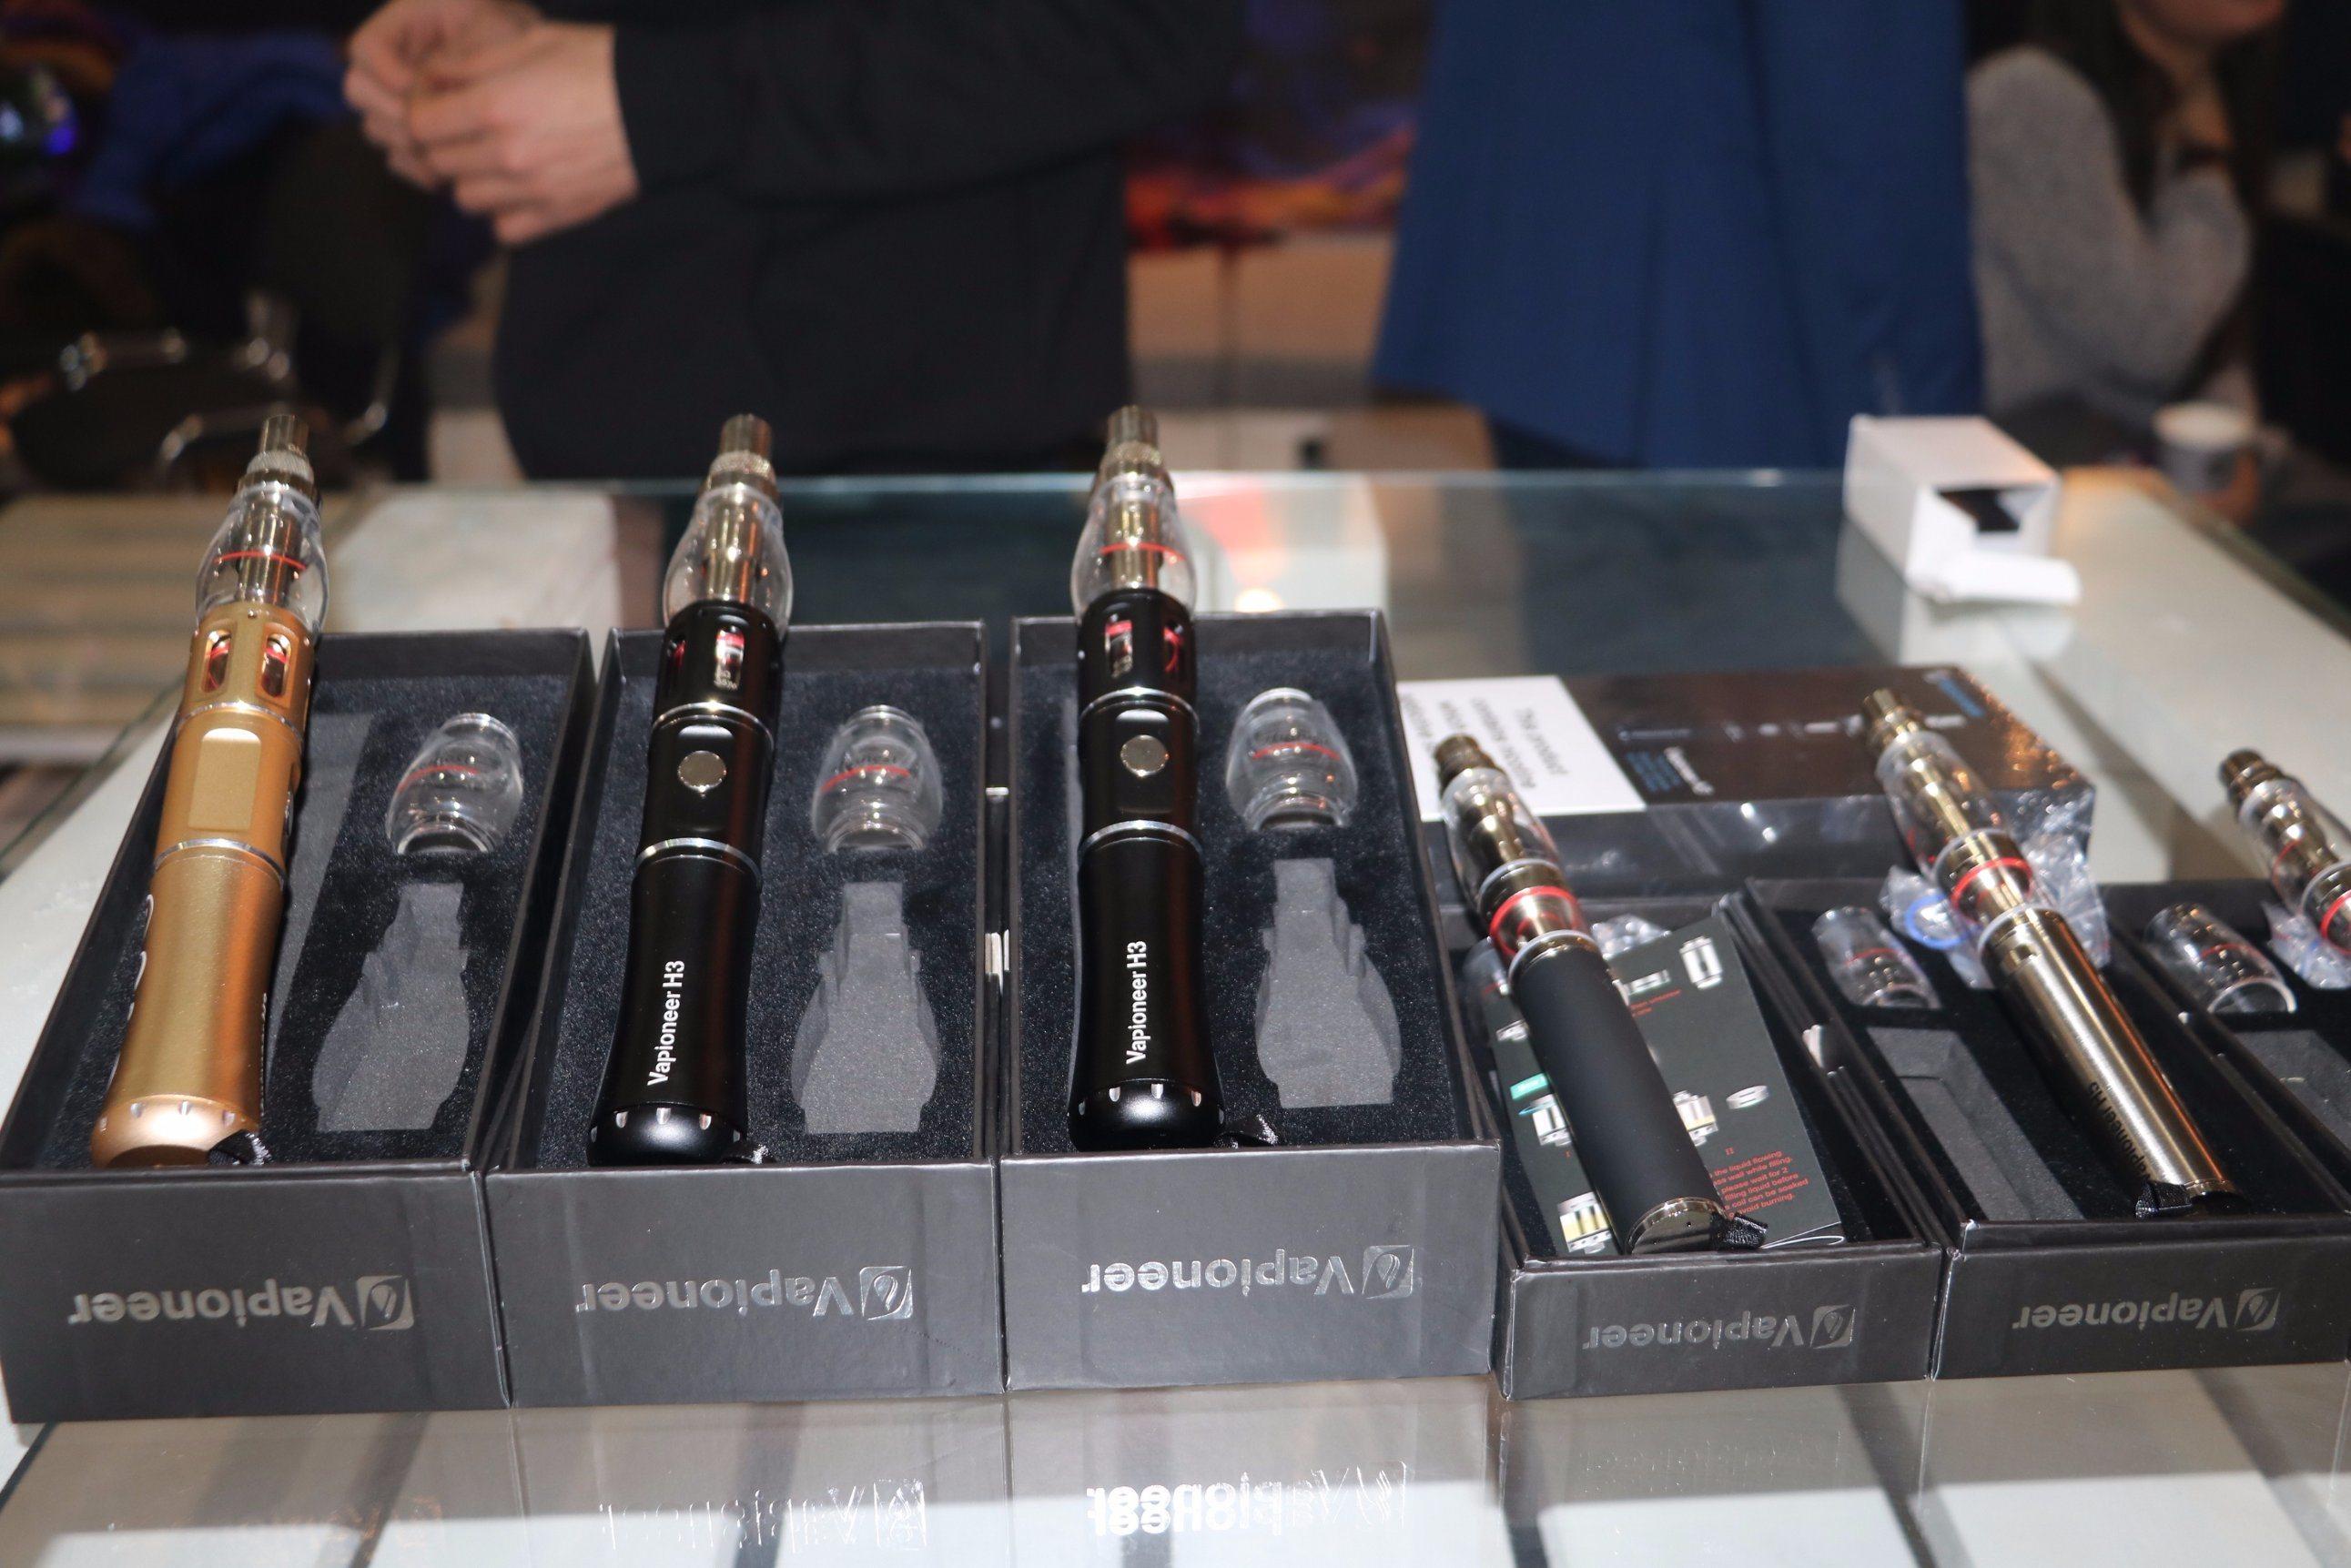 Portable Vapioneer H3 40W Vaporizer Pen E Hookah